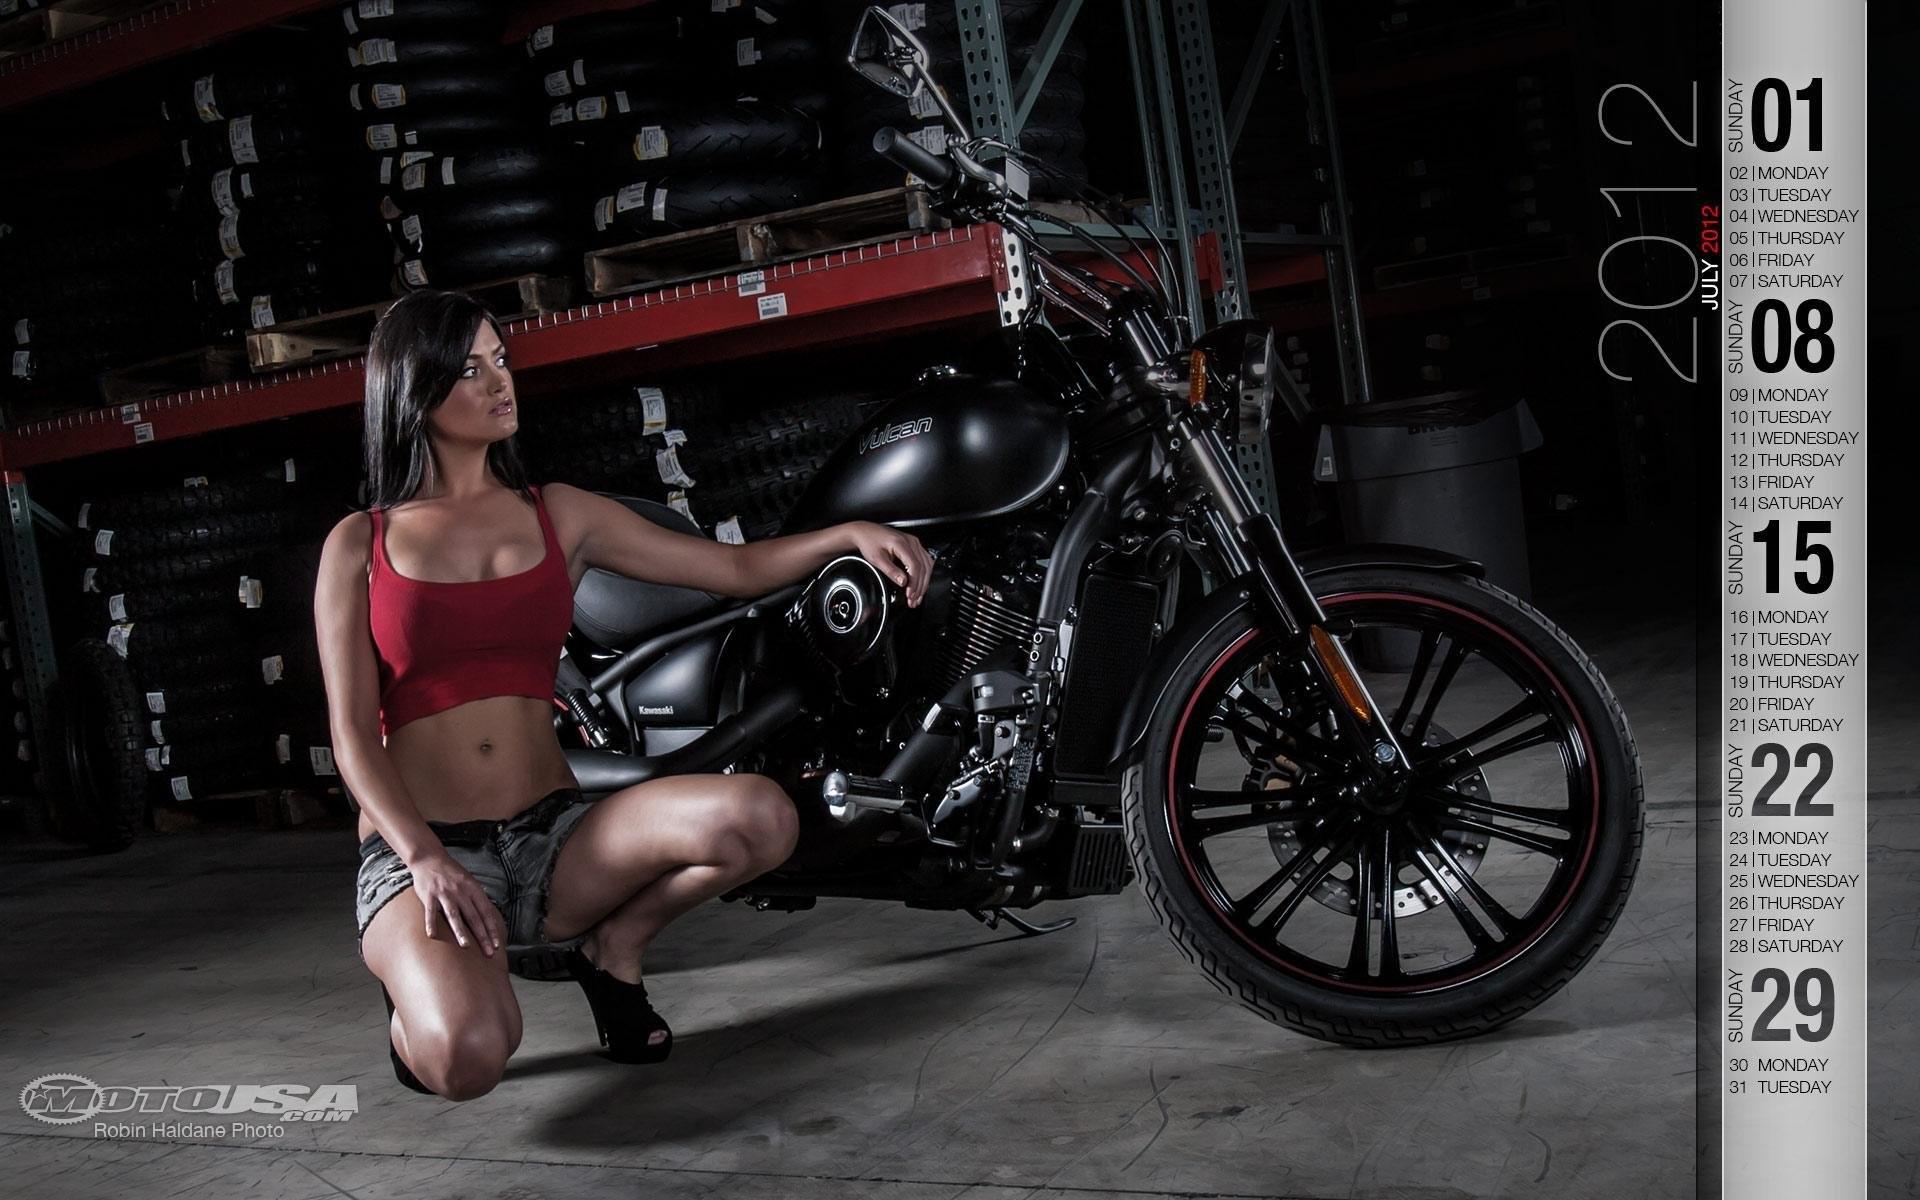 Custom Kawasaki 2012. SHARE. TAGS: Calendars Gallery Photo Motorcycle Girl  Chopper